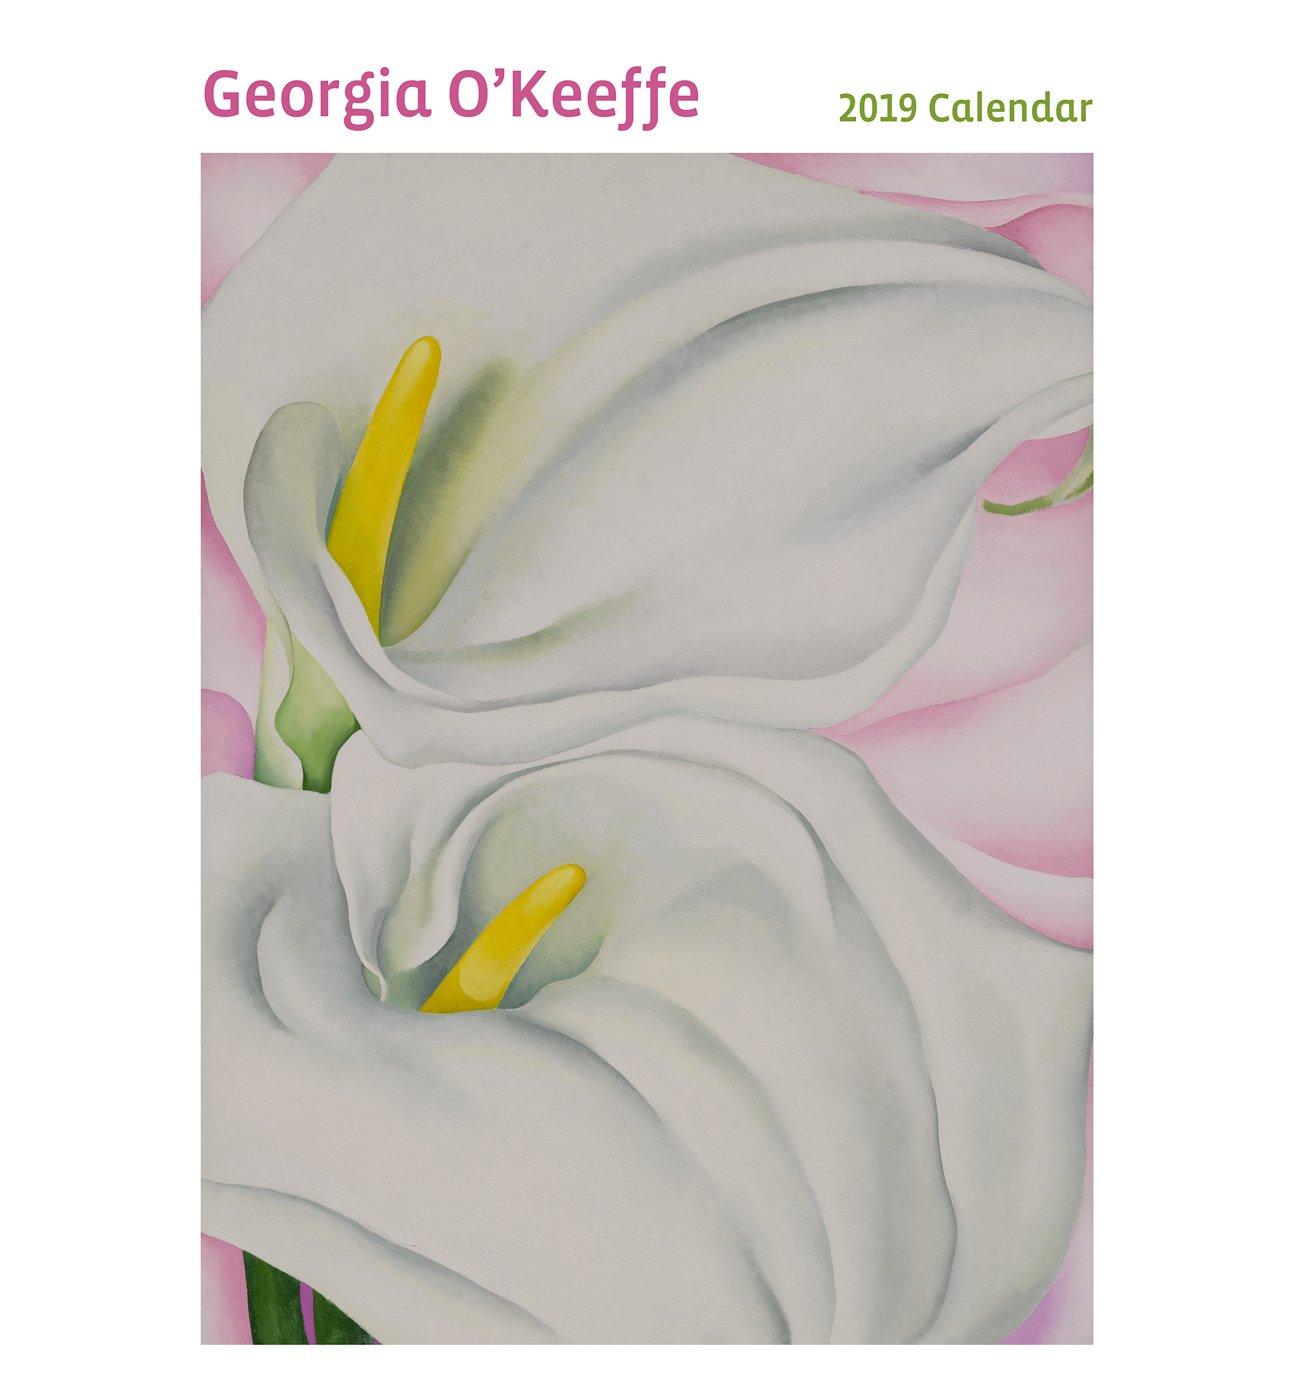 georgia okeeffe 2019 calendar